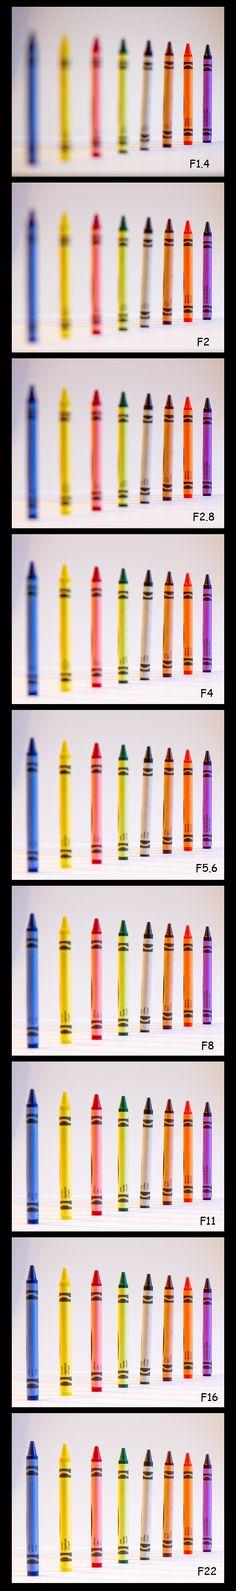 Aperture Depth of Field Comparison, Close Up